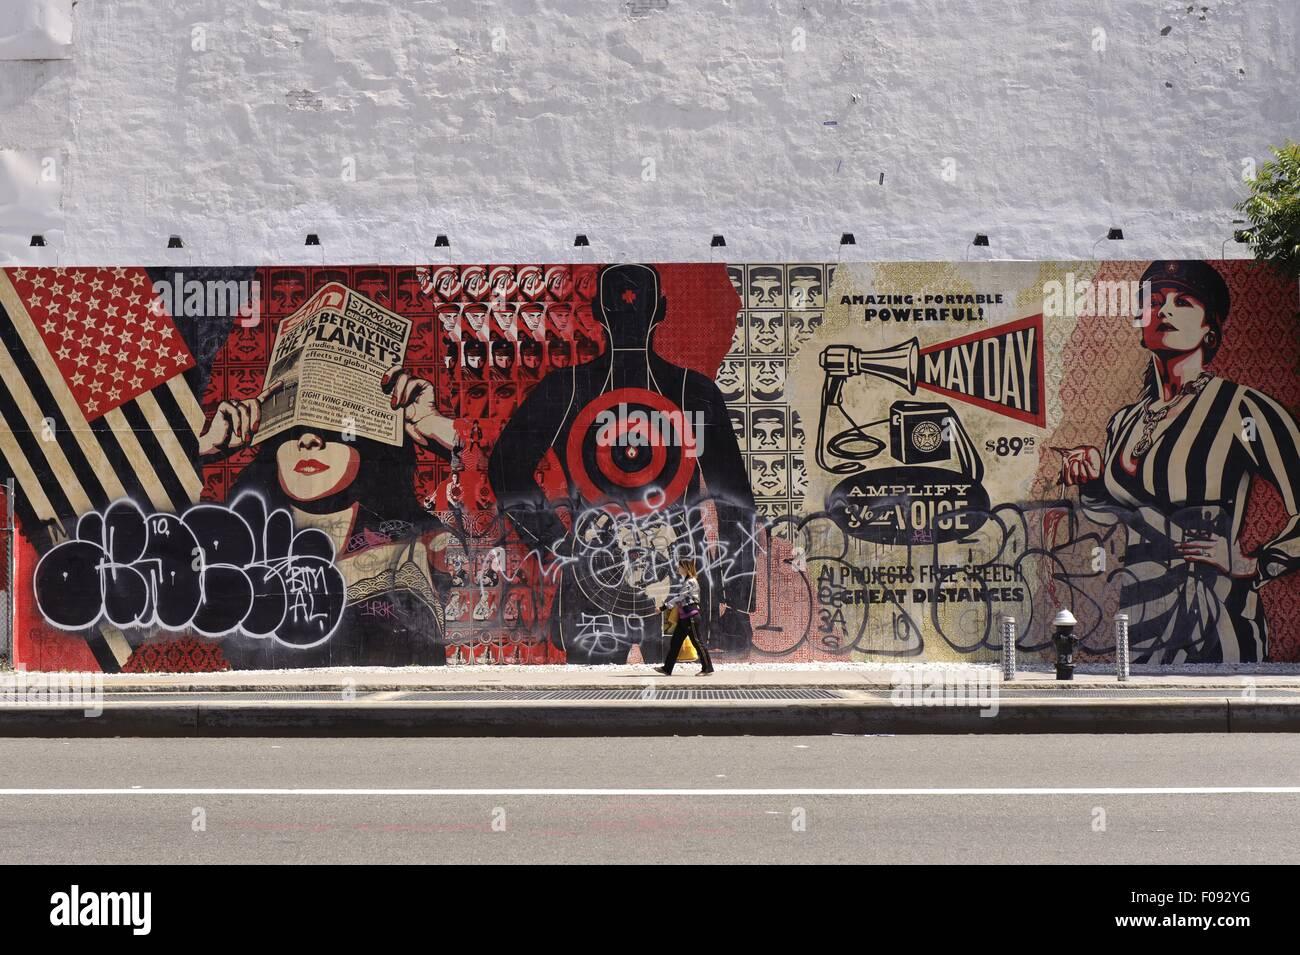 Street art on houston street new york stock image